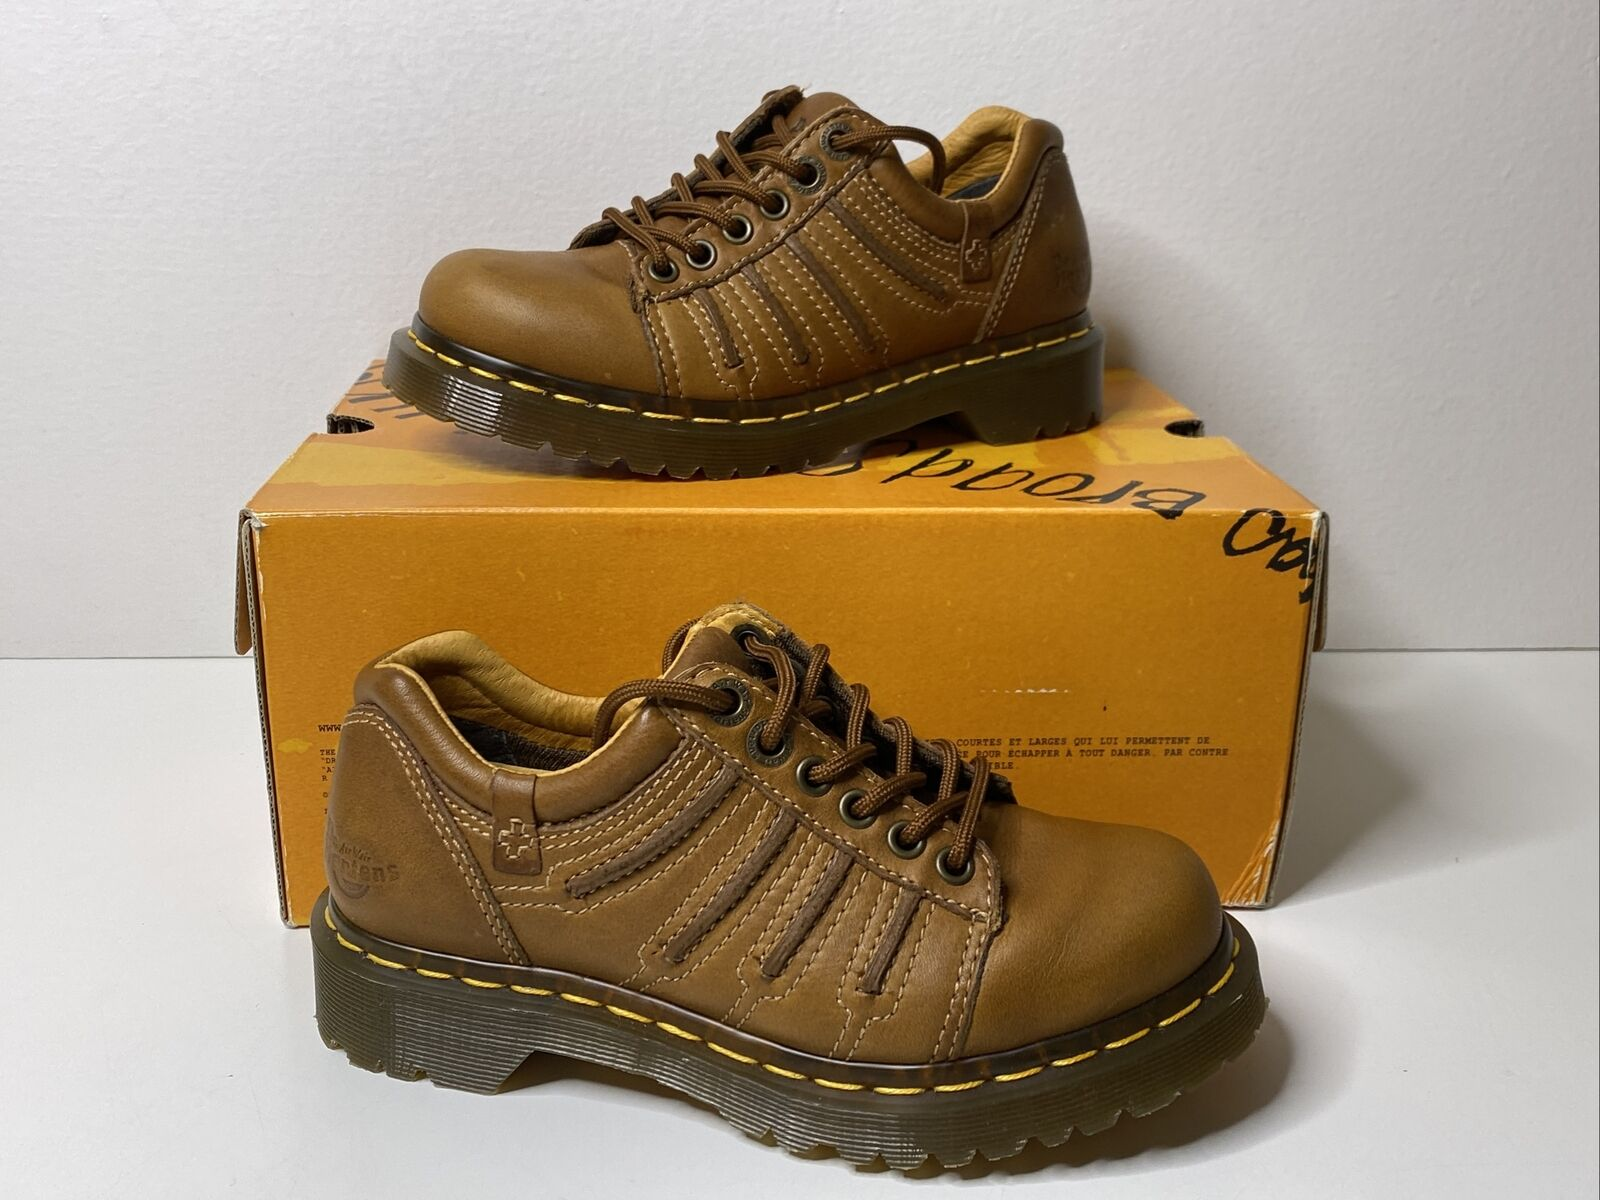 Dr Martens 12037 Brown Leather Oxford 6-eyelet Women's Shoe Sz US 5 UK 3